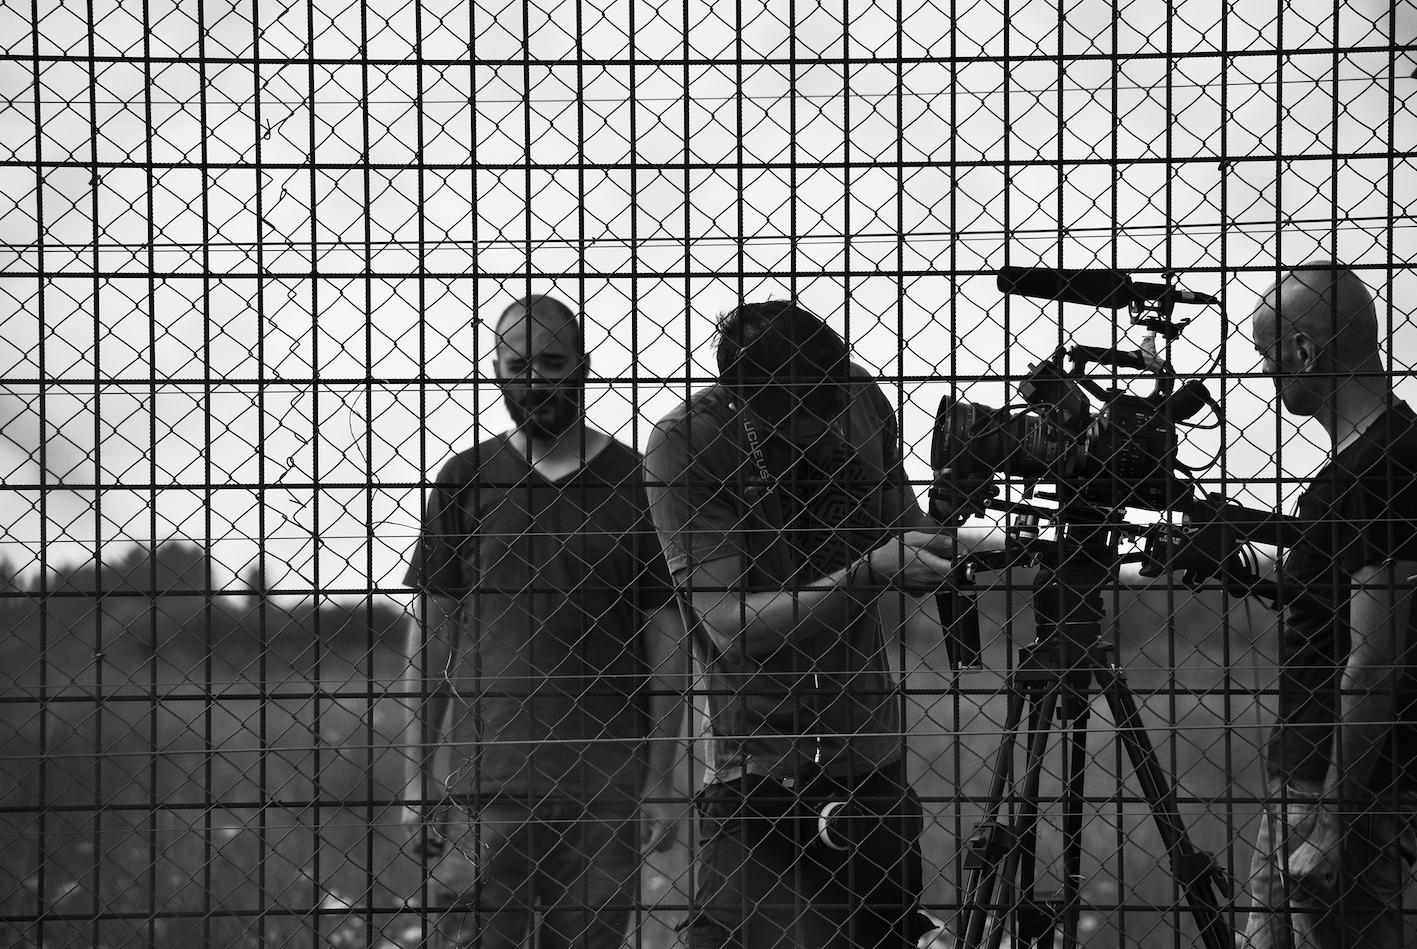 Filippo Berta, One by One (work in progress), 2019, Italian Council 2019, backstage